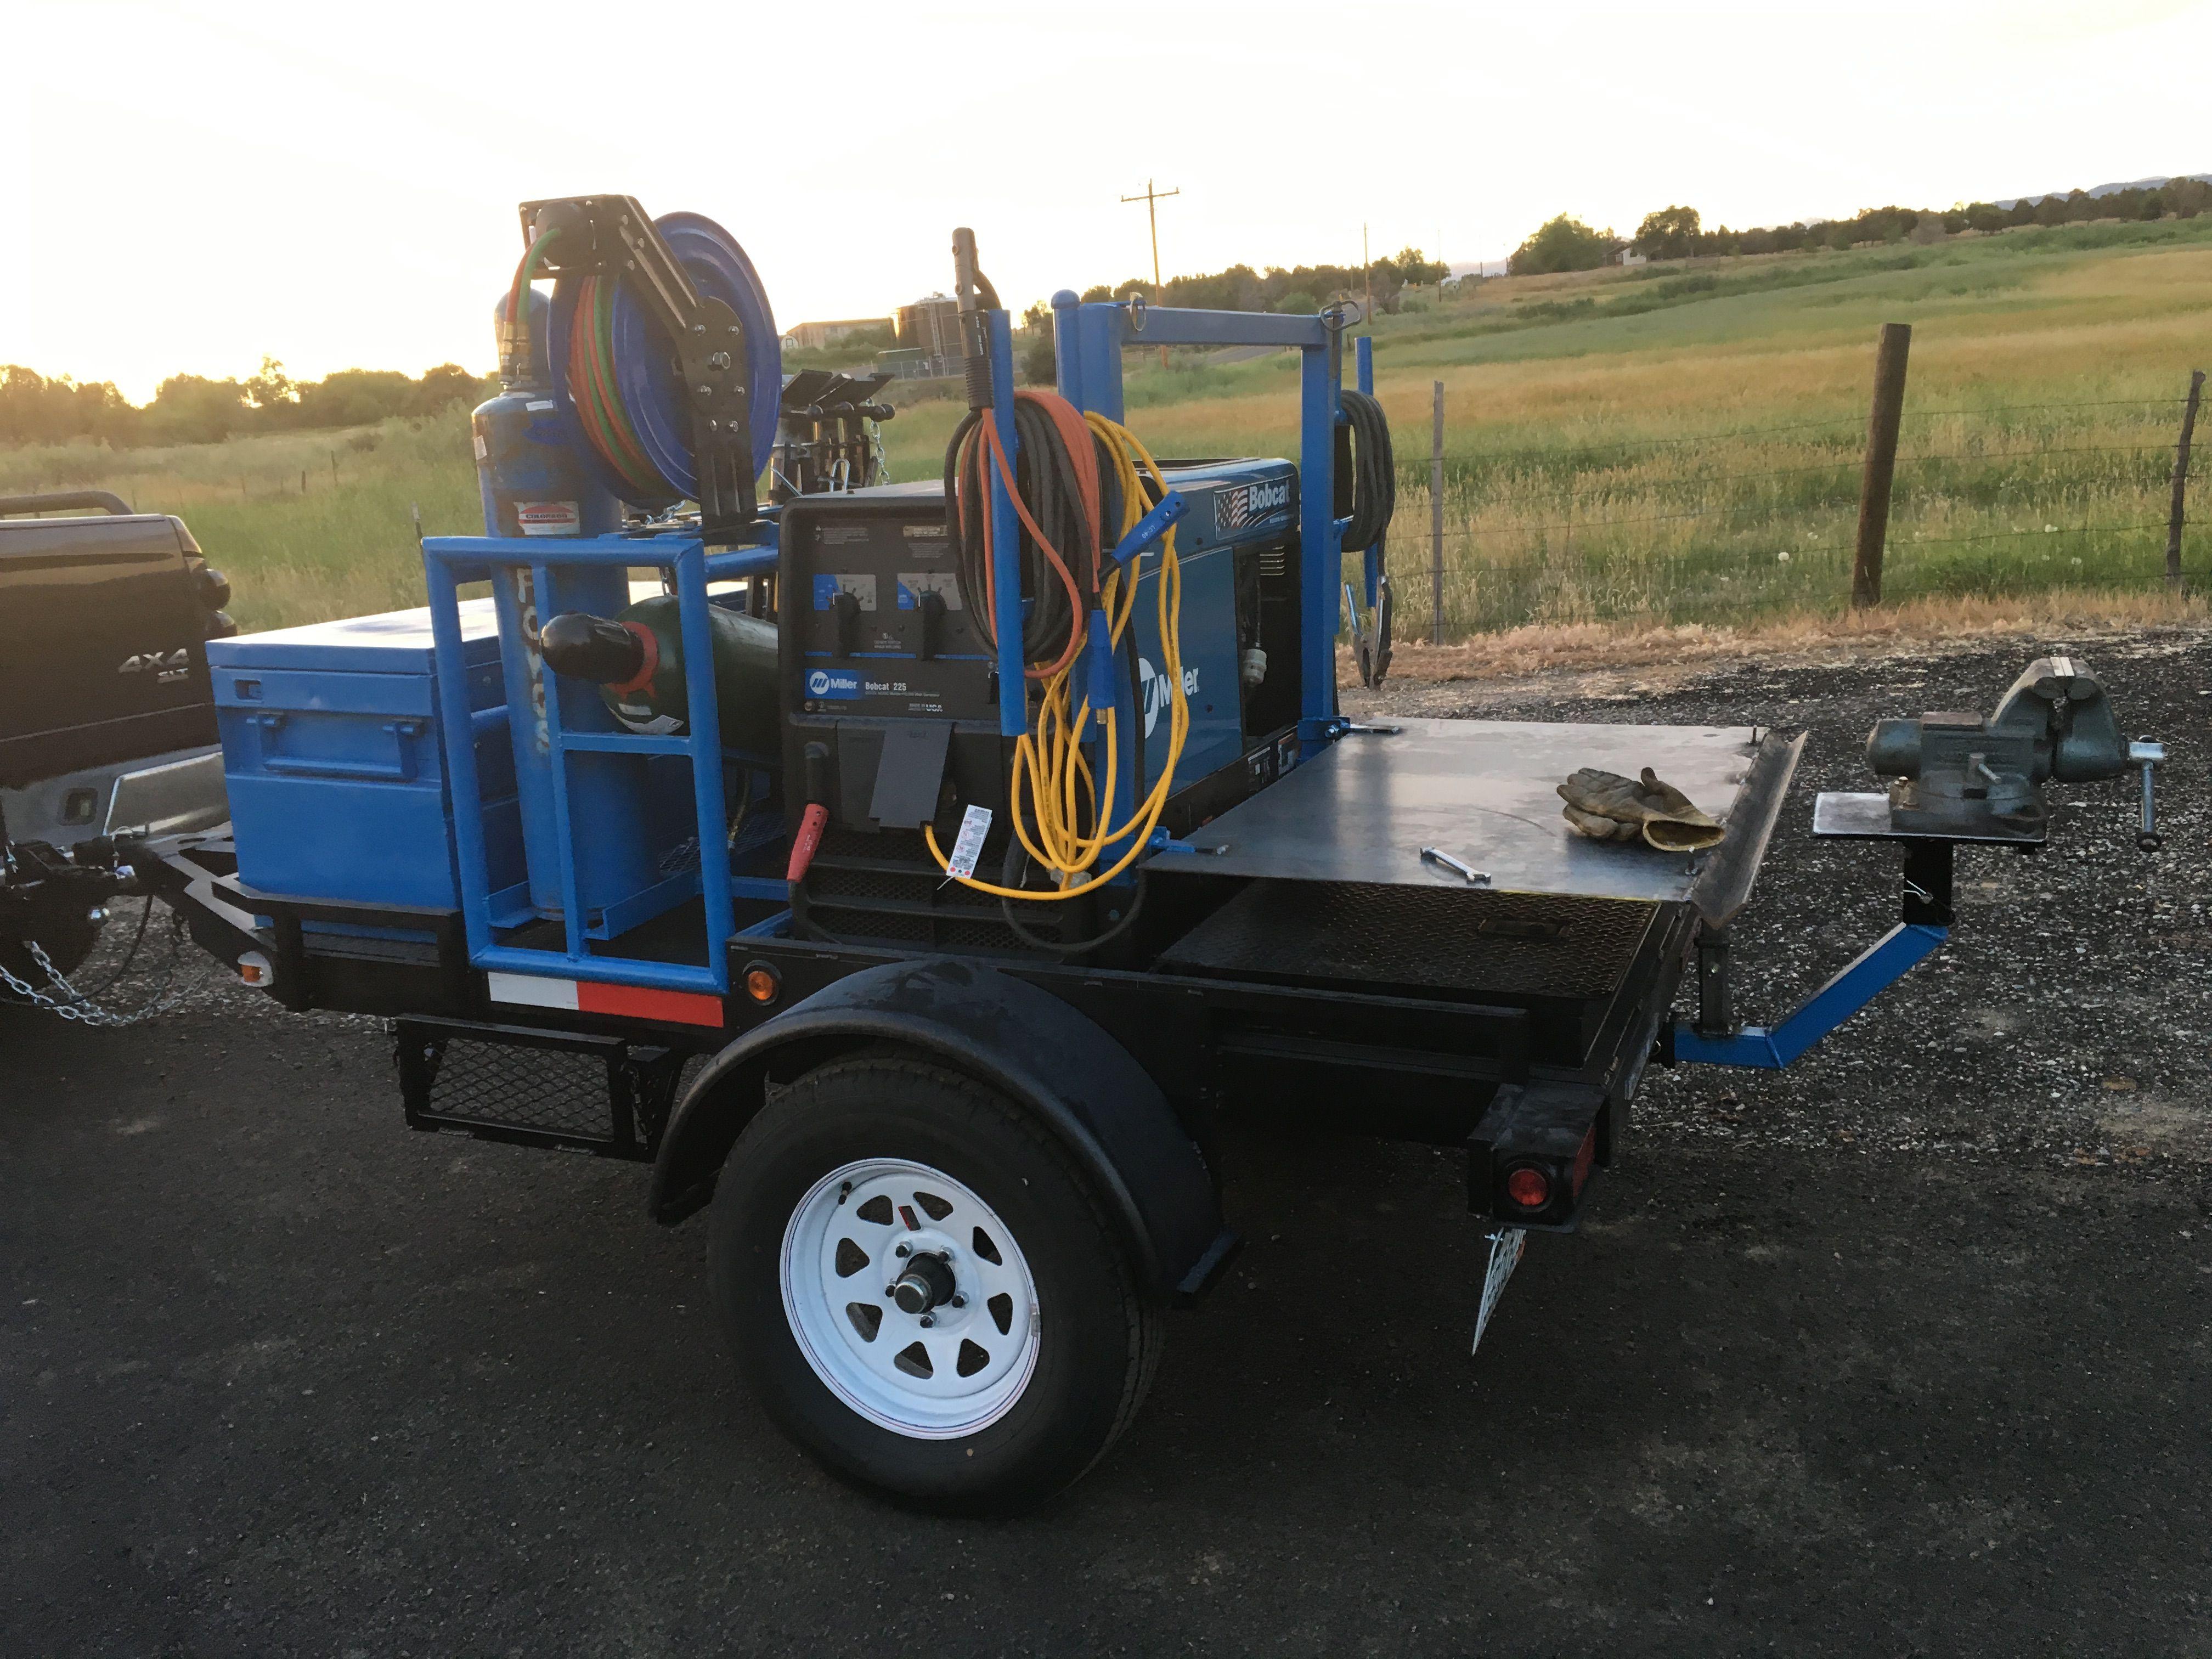 Homemade welding trailer Welding trailer, Welding